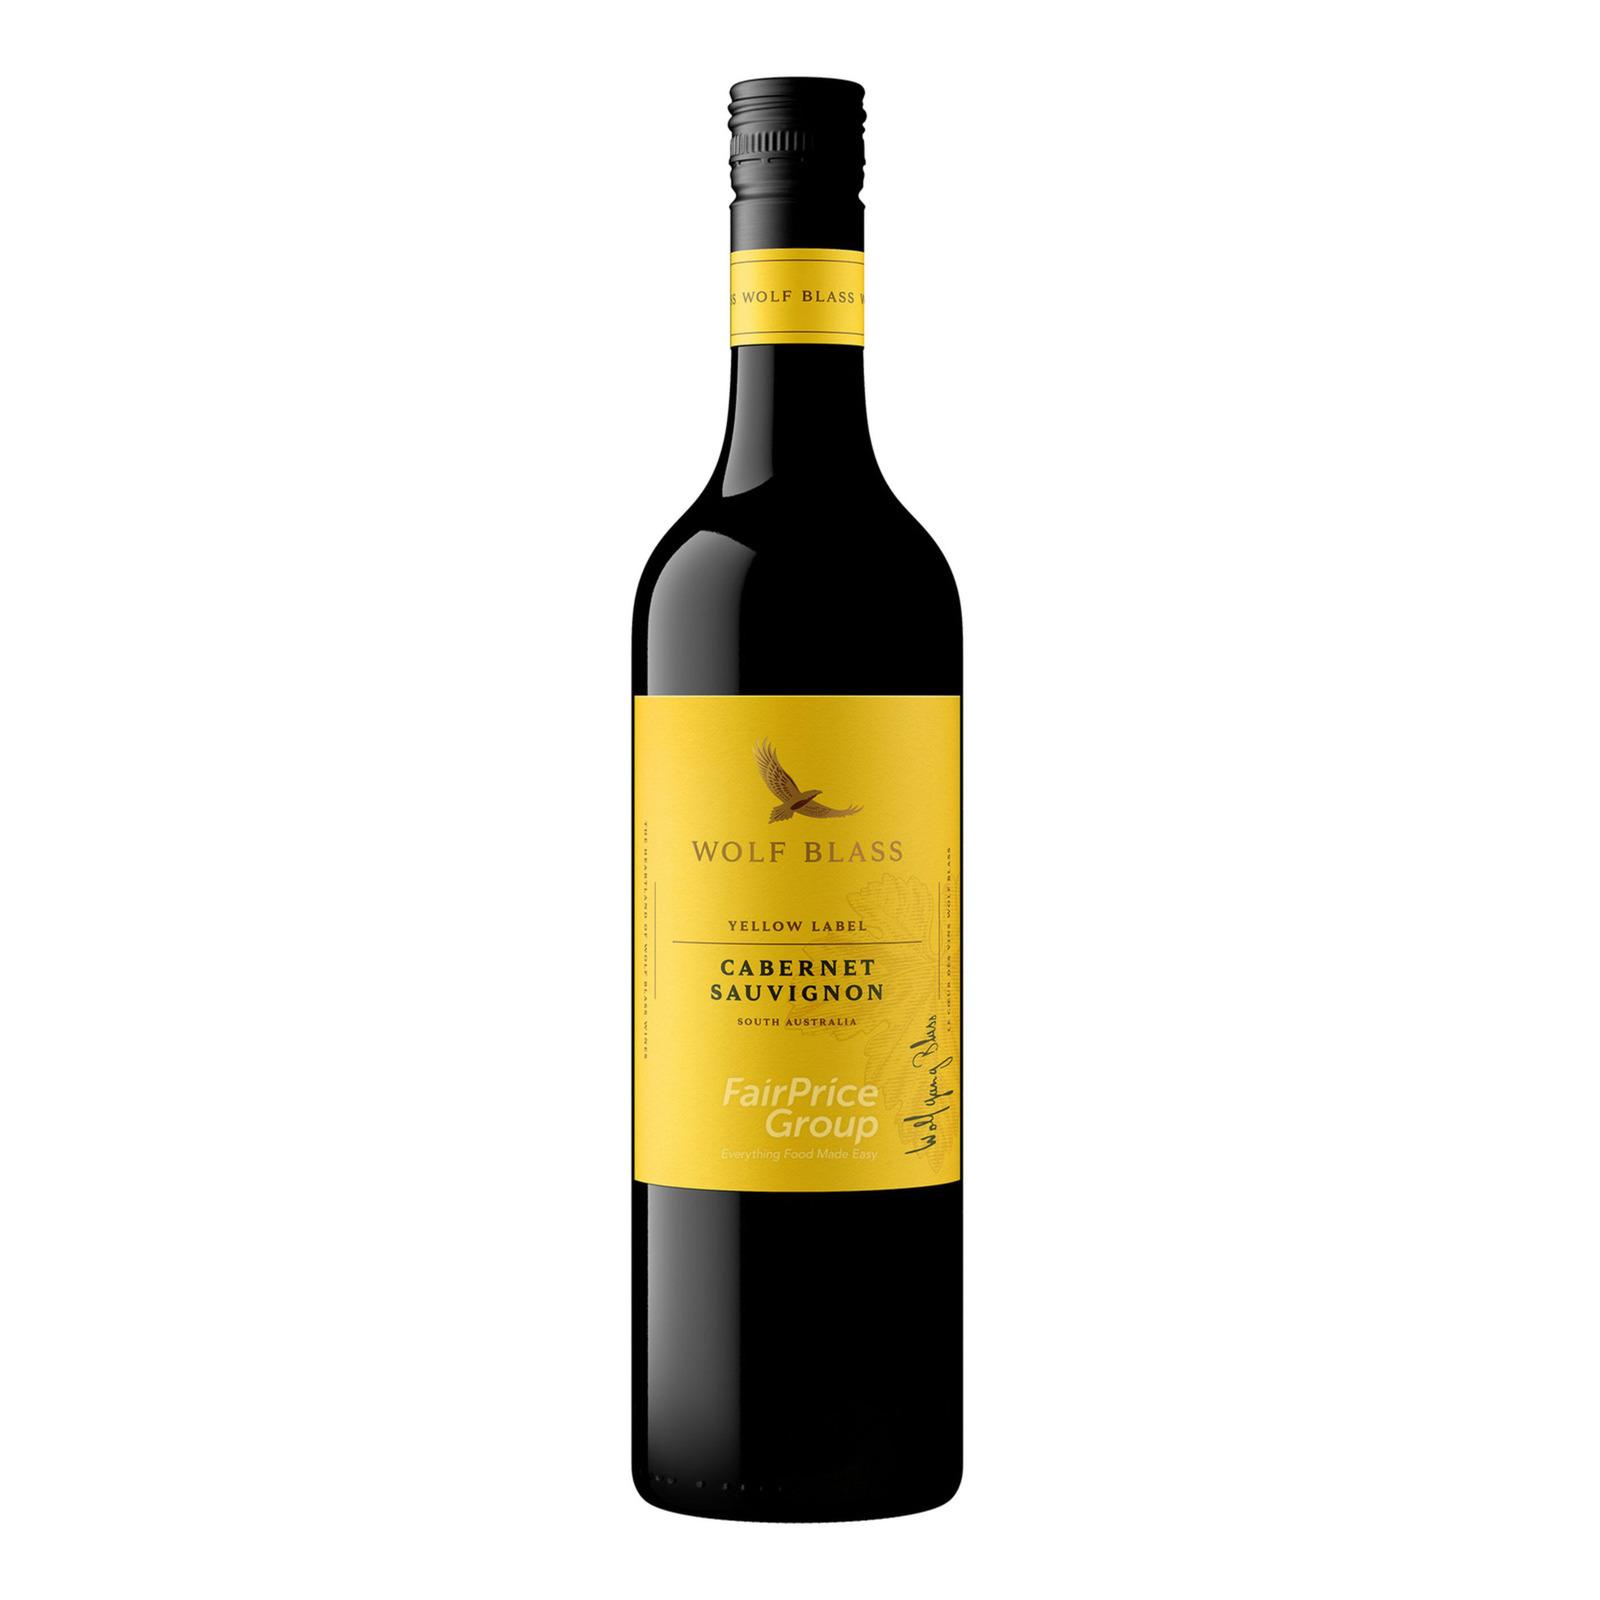 Wolf Blass Yellow Label Red Wine - Cabernet Sauvignon